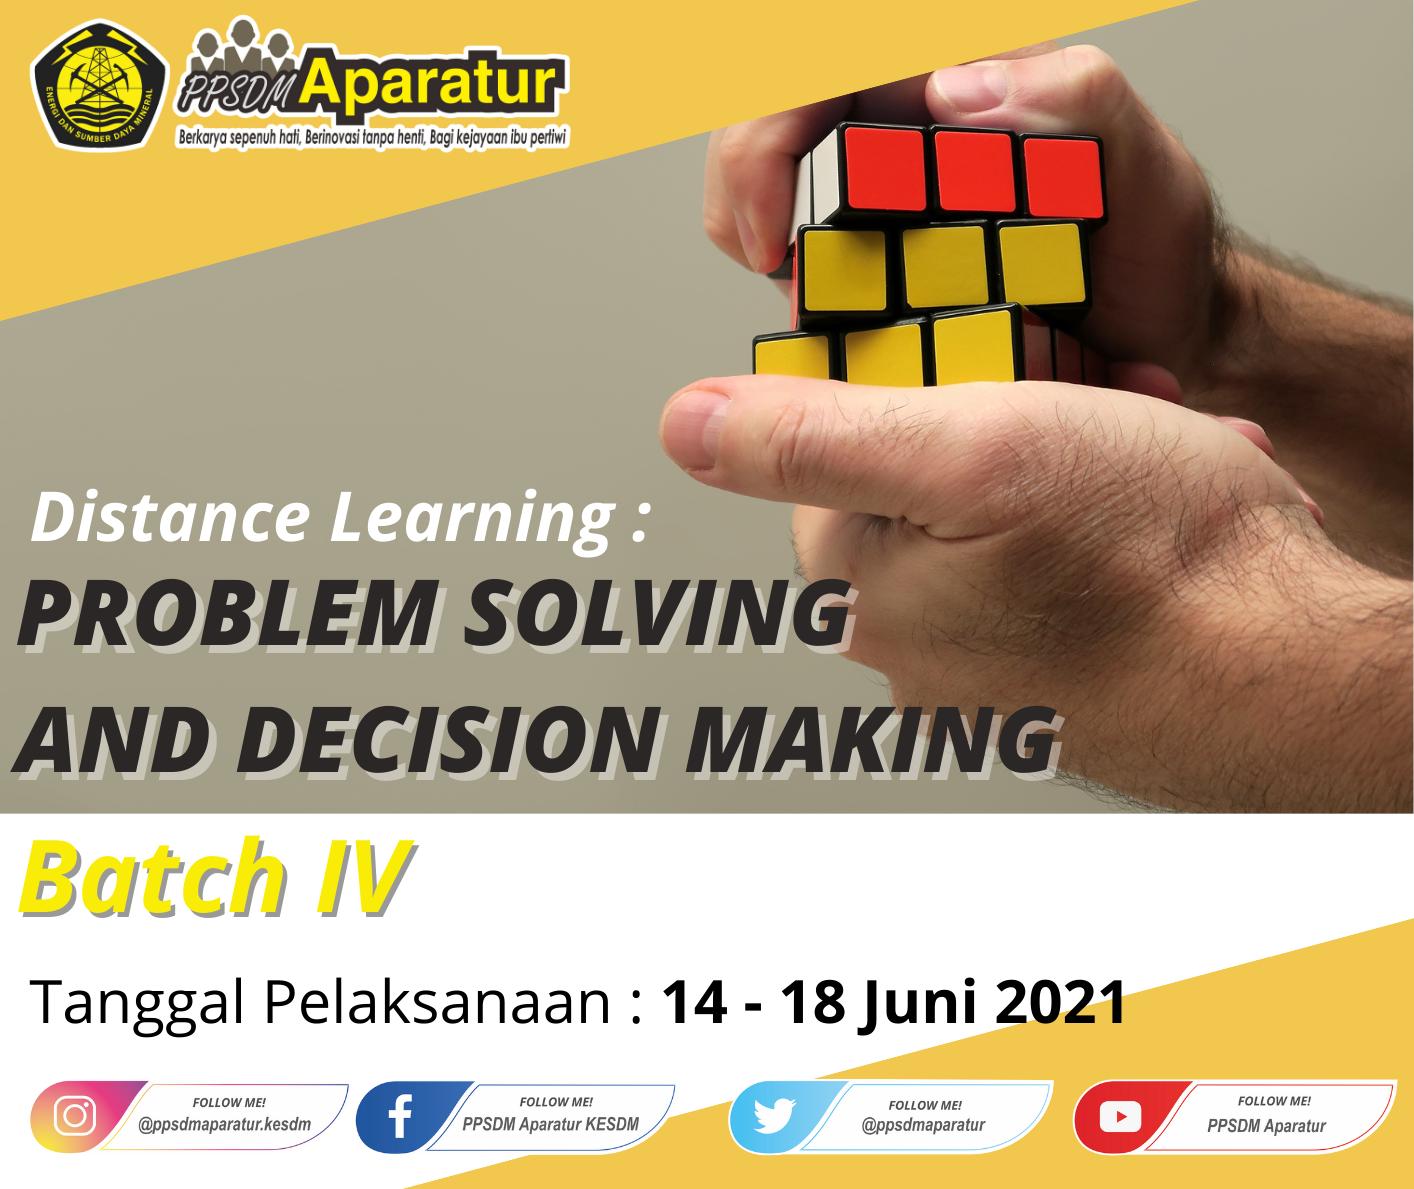 DL : Problem Solving and Decision Making Batch IV